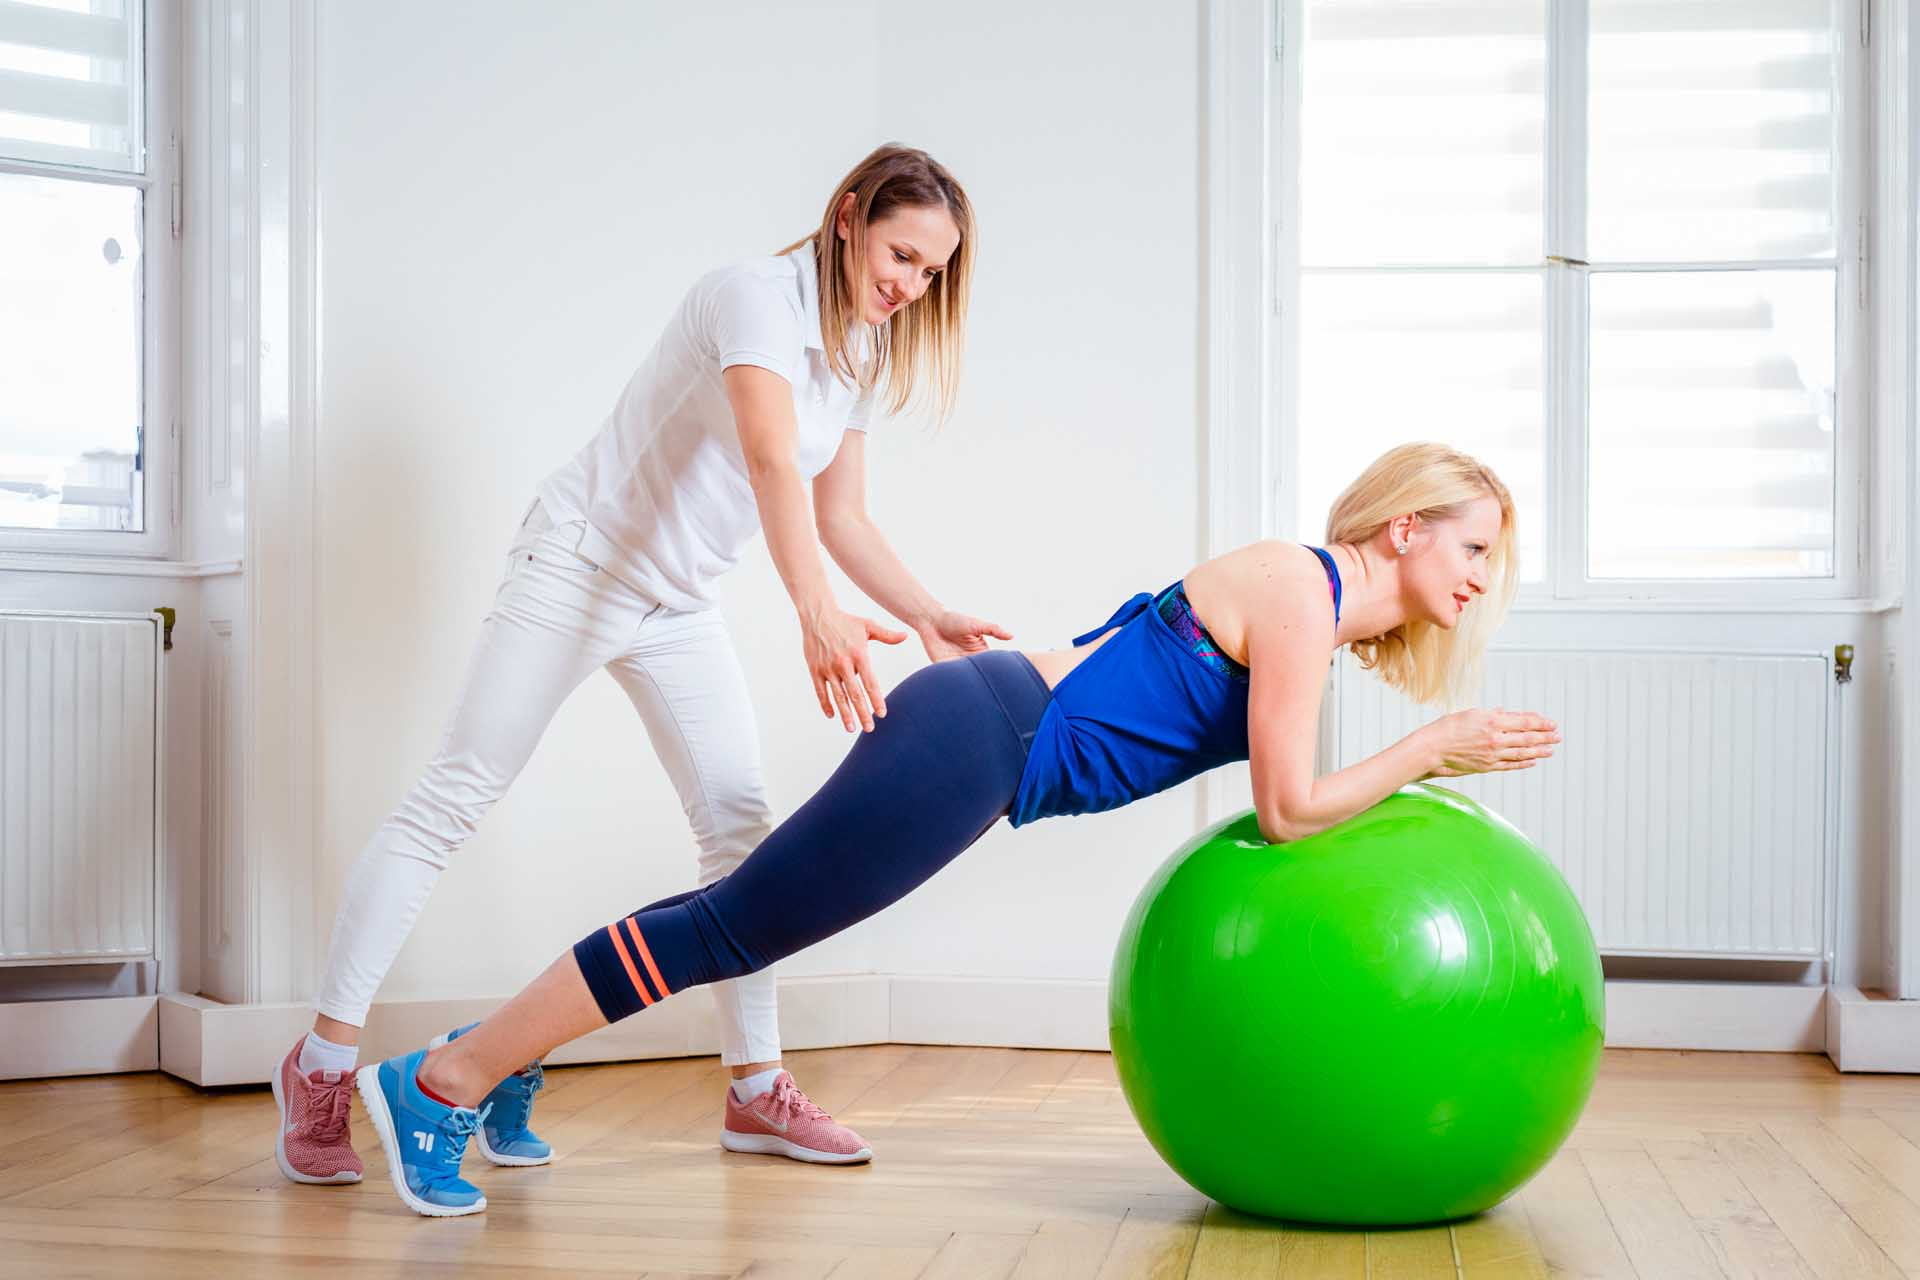 Paulina Haller ist Physiotherapeutin und Sportphysiotherapeutin i.A. bei Kinemedic - Praxis für physikalische, orthopädische und rehabilitative Medizin.